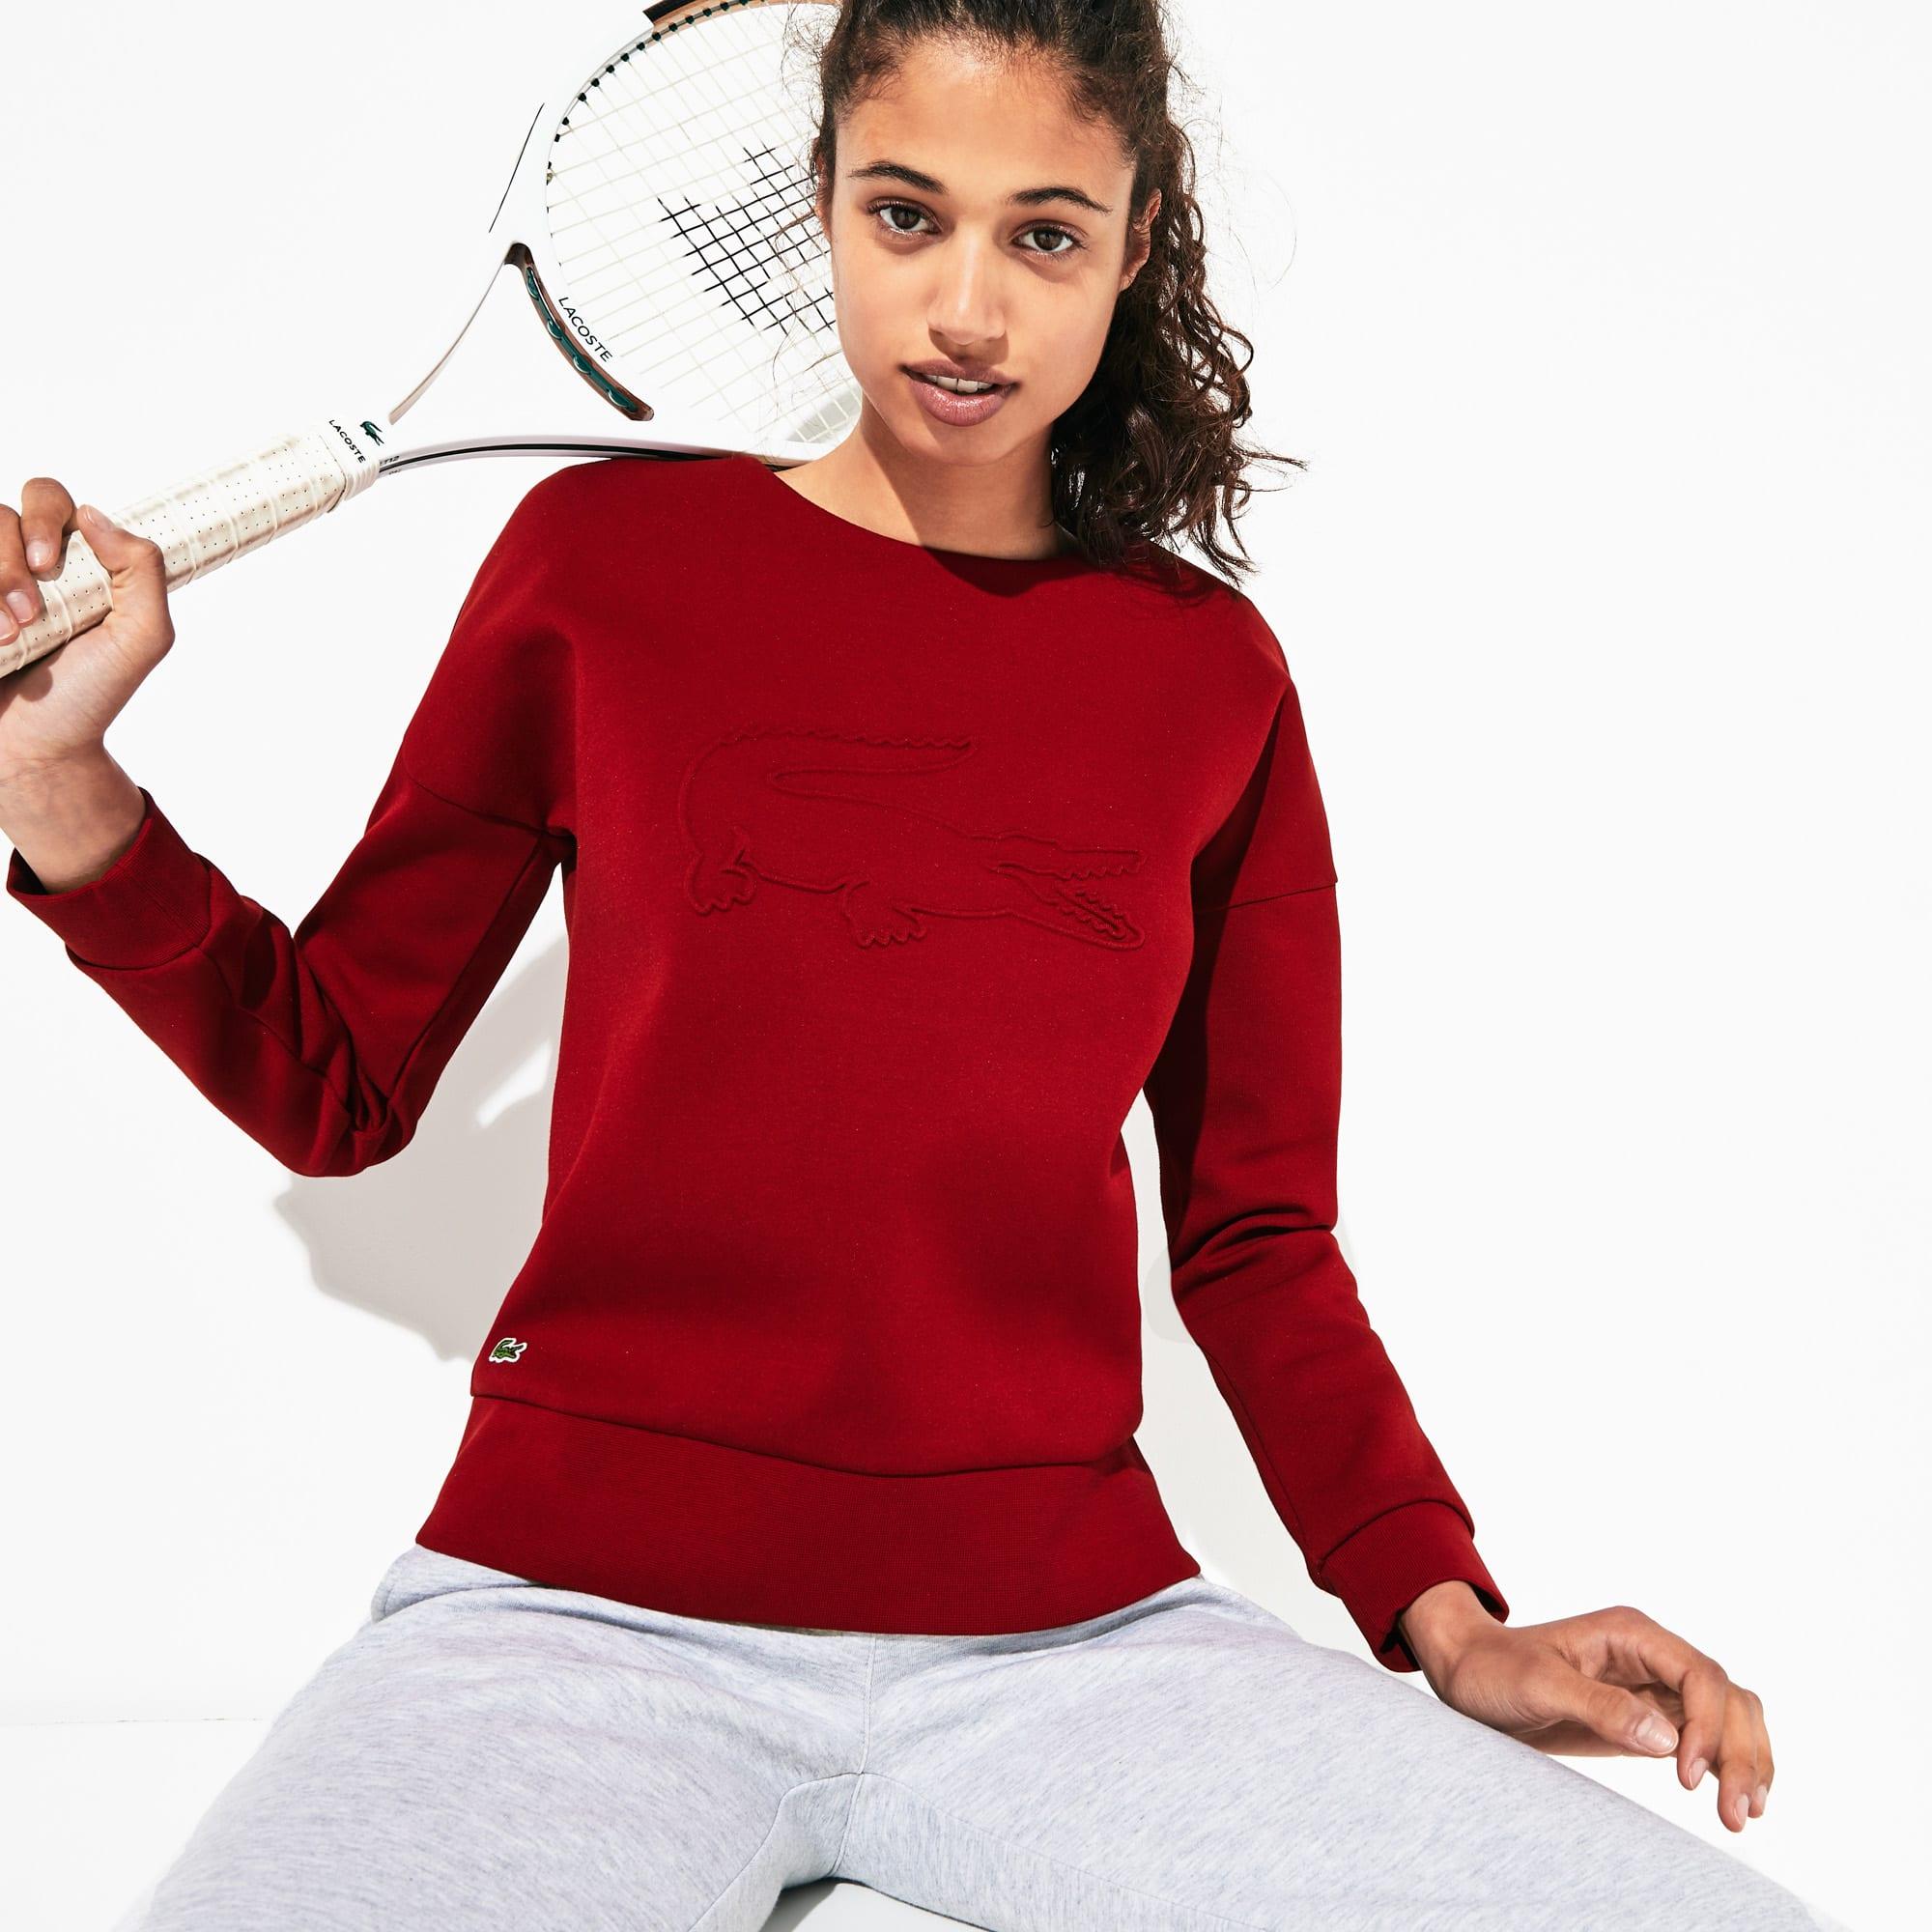 Lacoste Women's SPORT Oversize Croc Cotton-Blend Sweatshirt